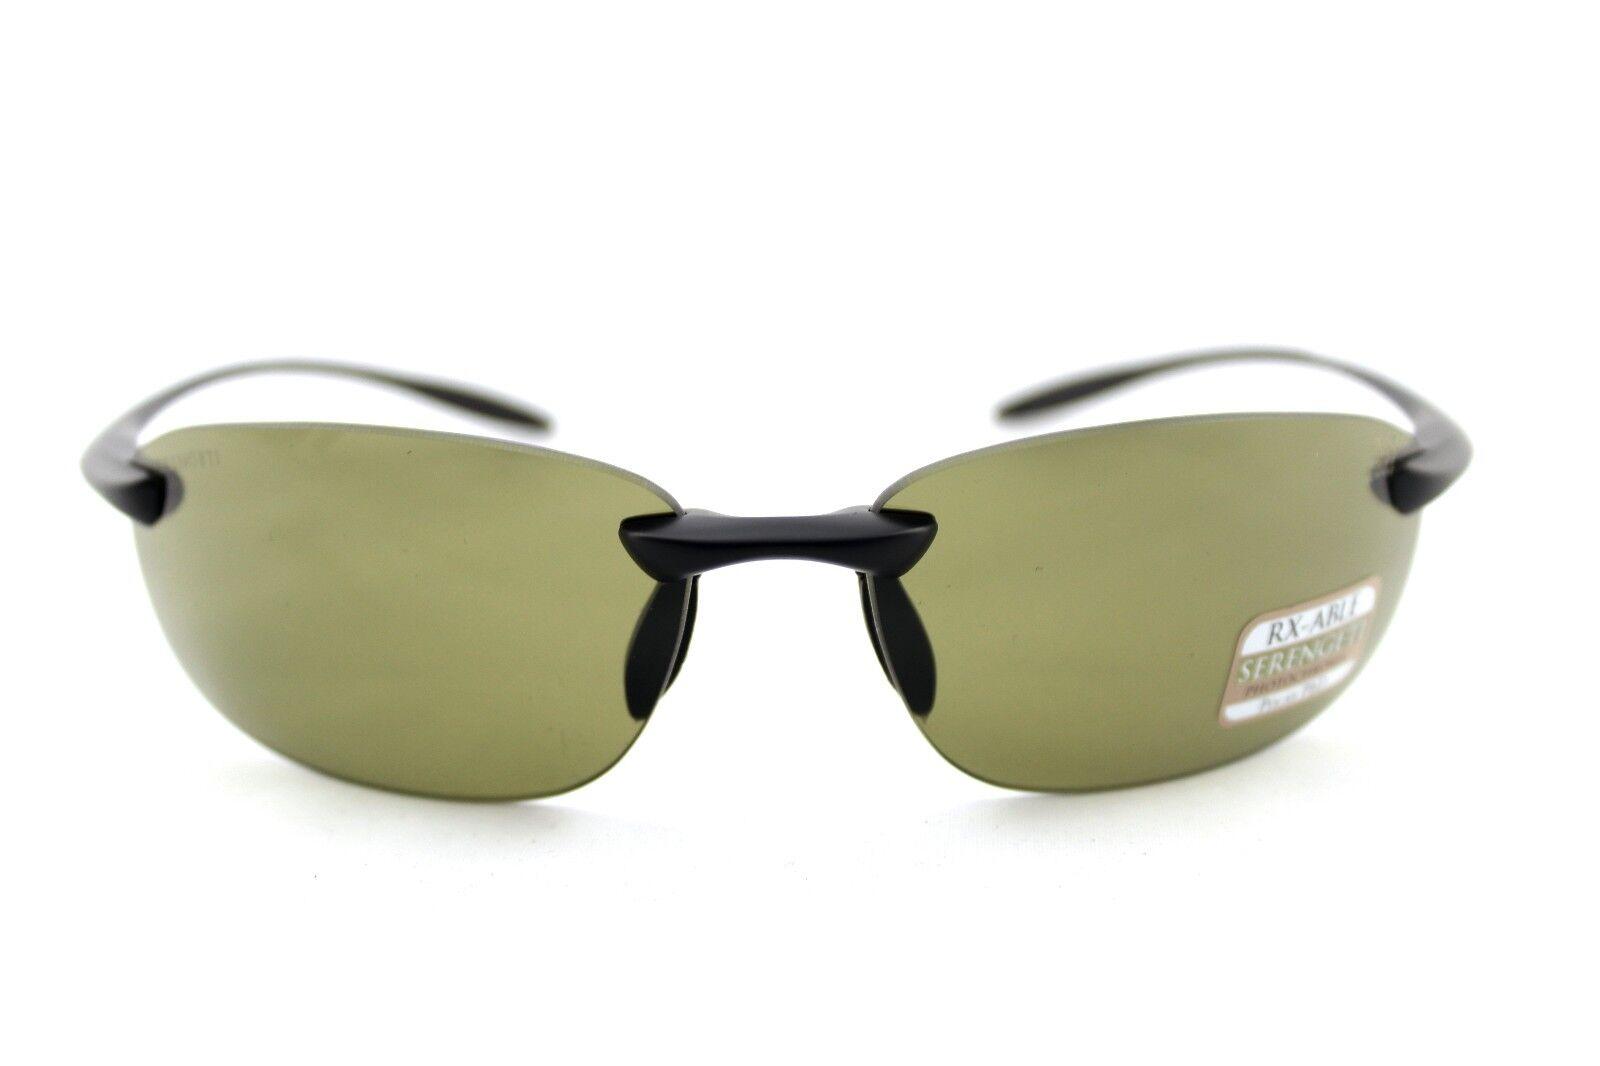 fbdf24cd225 Serengeti 8481 Men s Sunglasses for sale online